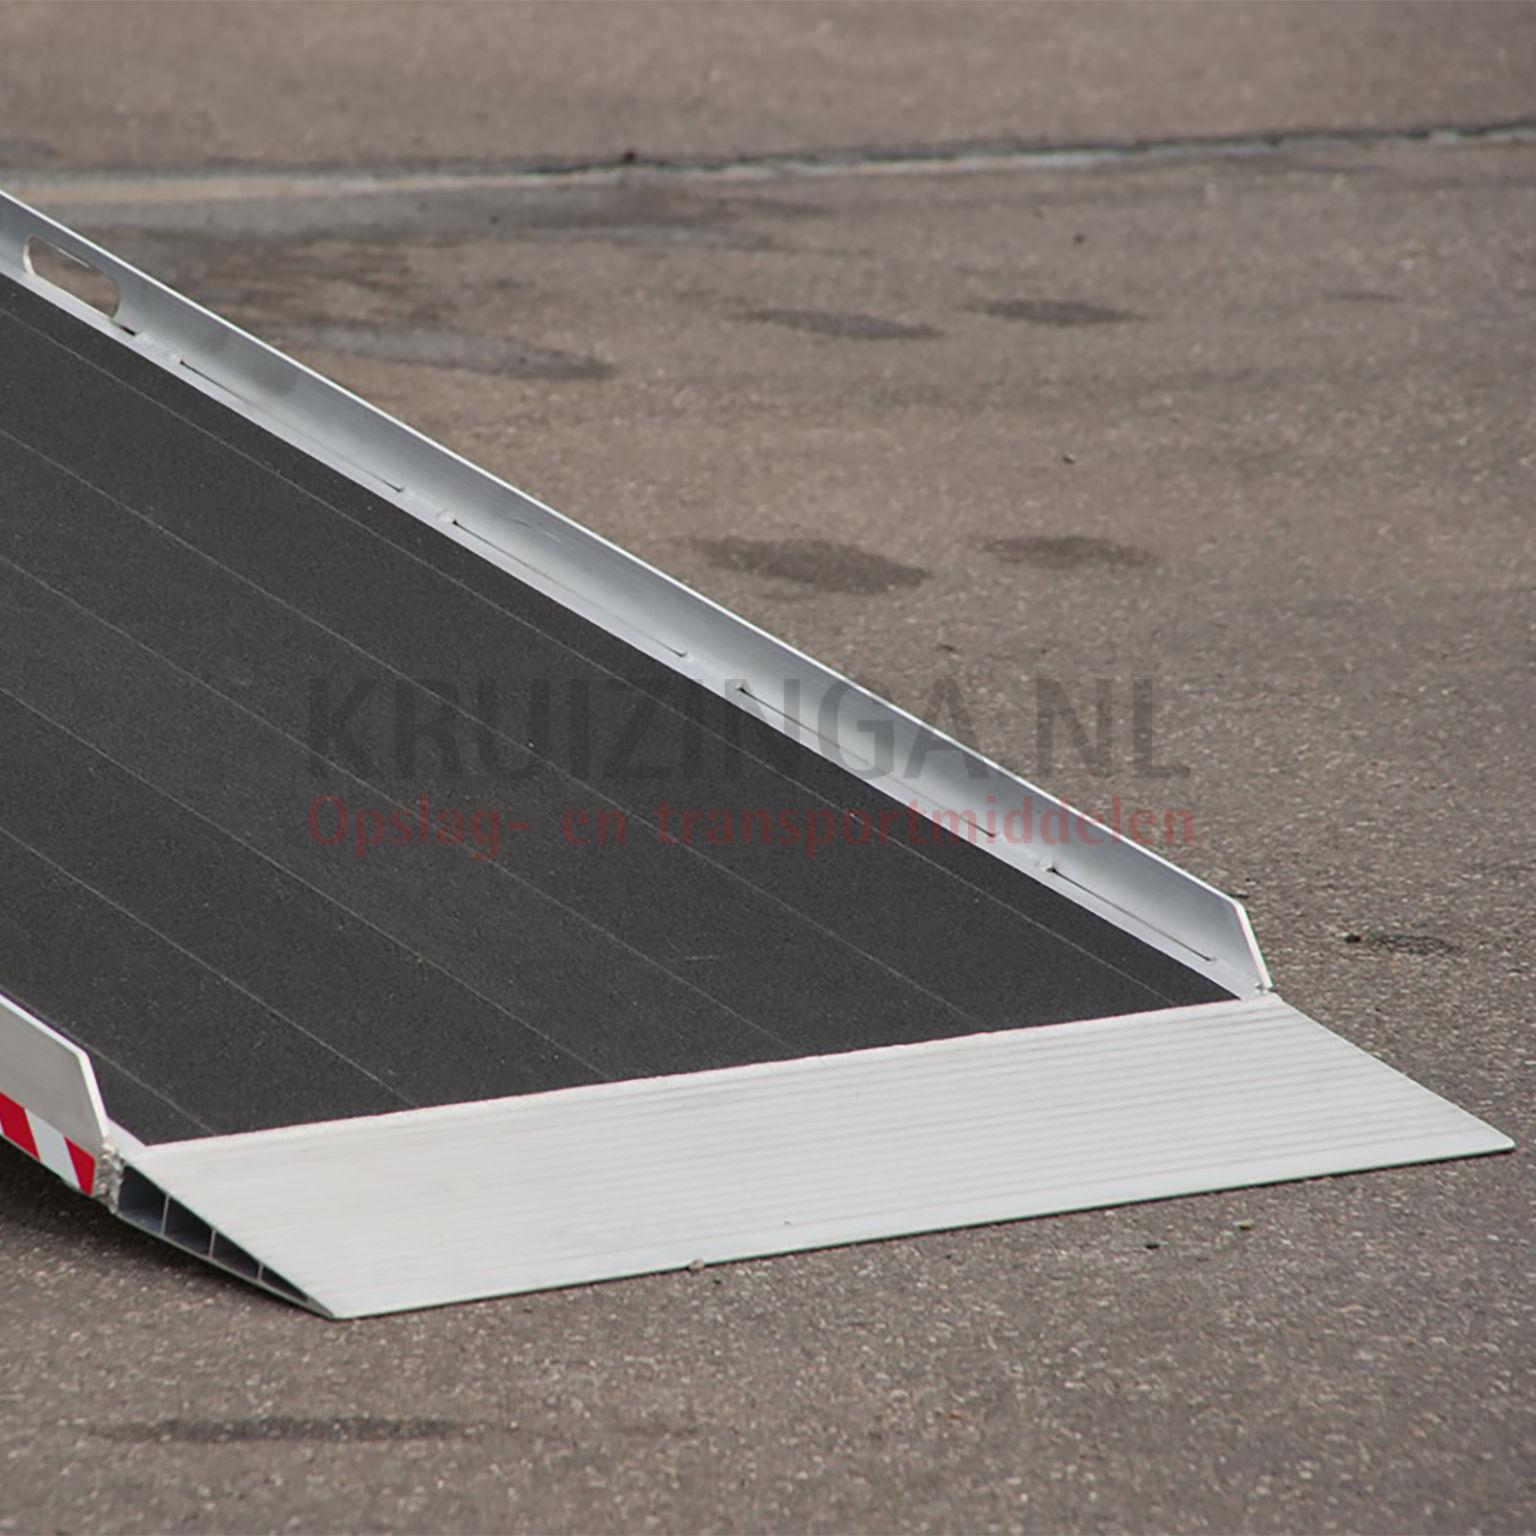 verladeschienen auffahrrampen auffahrrampe aluminium 300 cm pro st ck 1208 frei haus. Black Bedroom Furniture Sets. Home Design Ideas